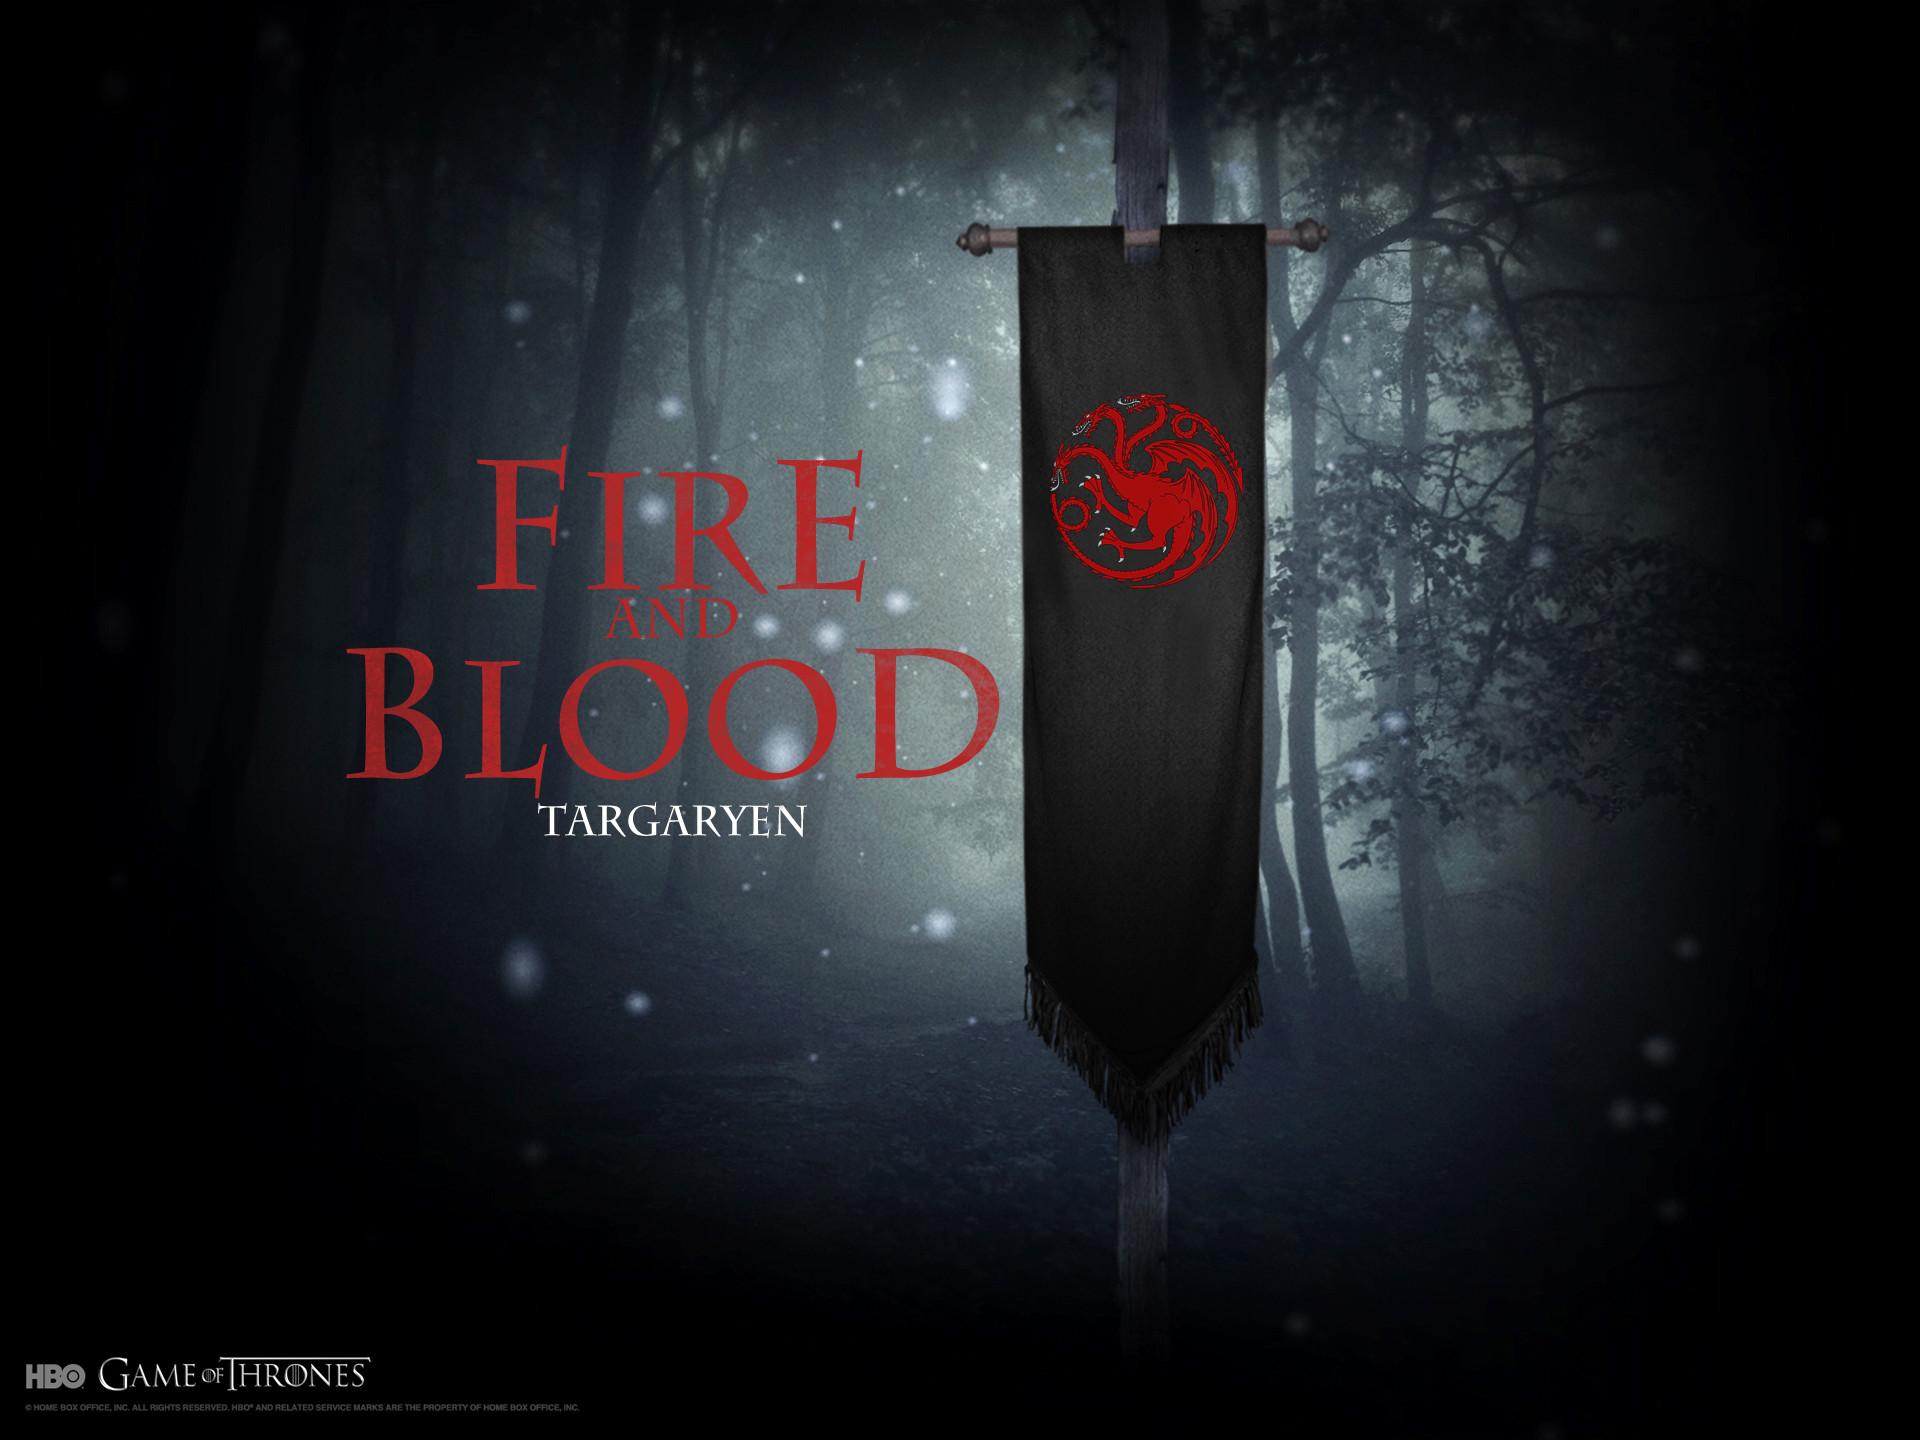 House Targaryen – Game of Thrones Wallpaper (31776802) – Fanpop